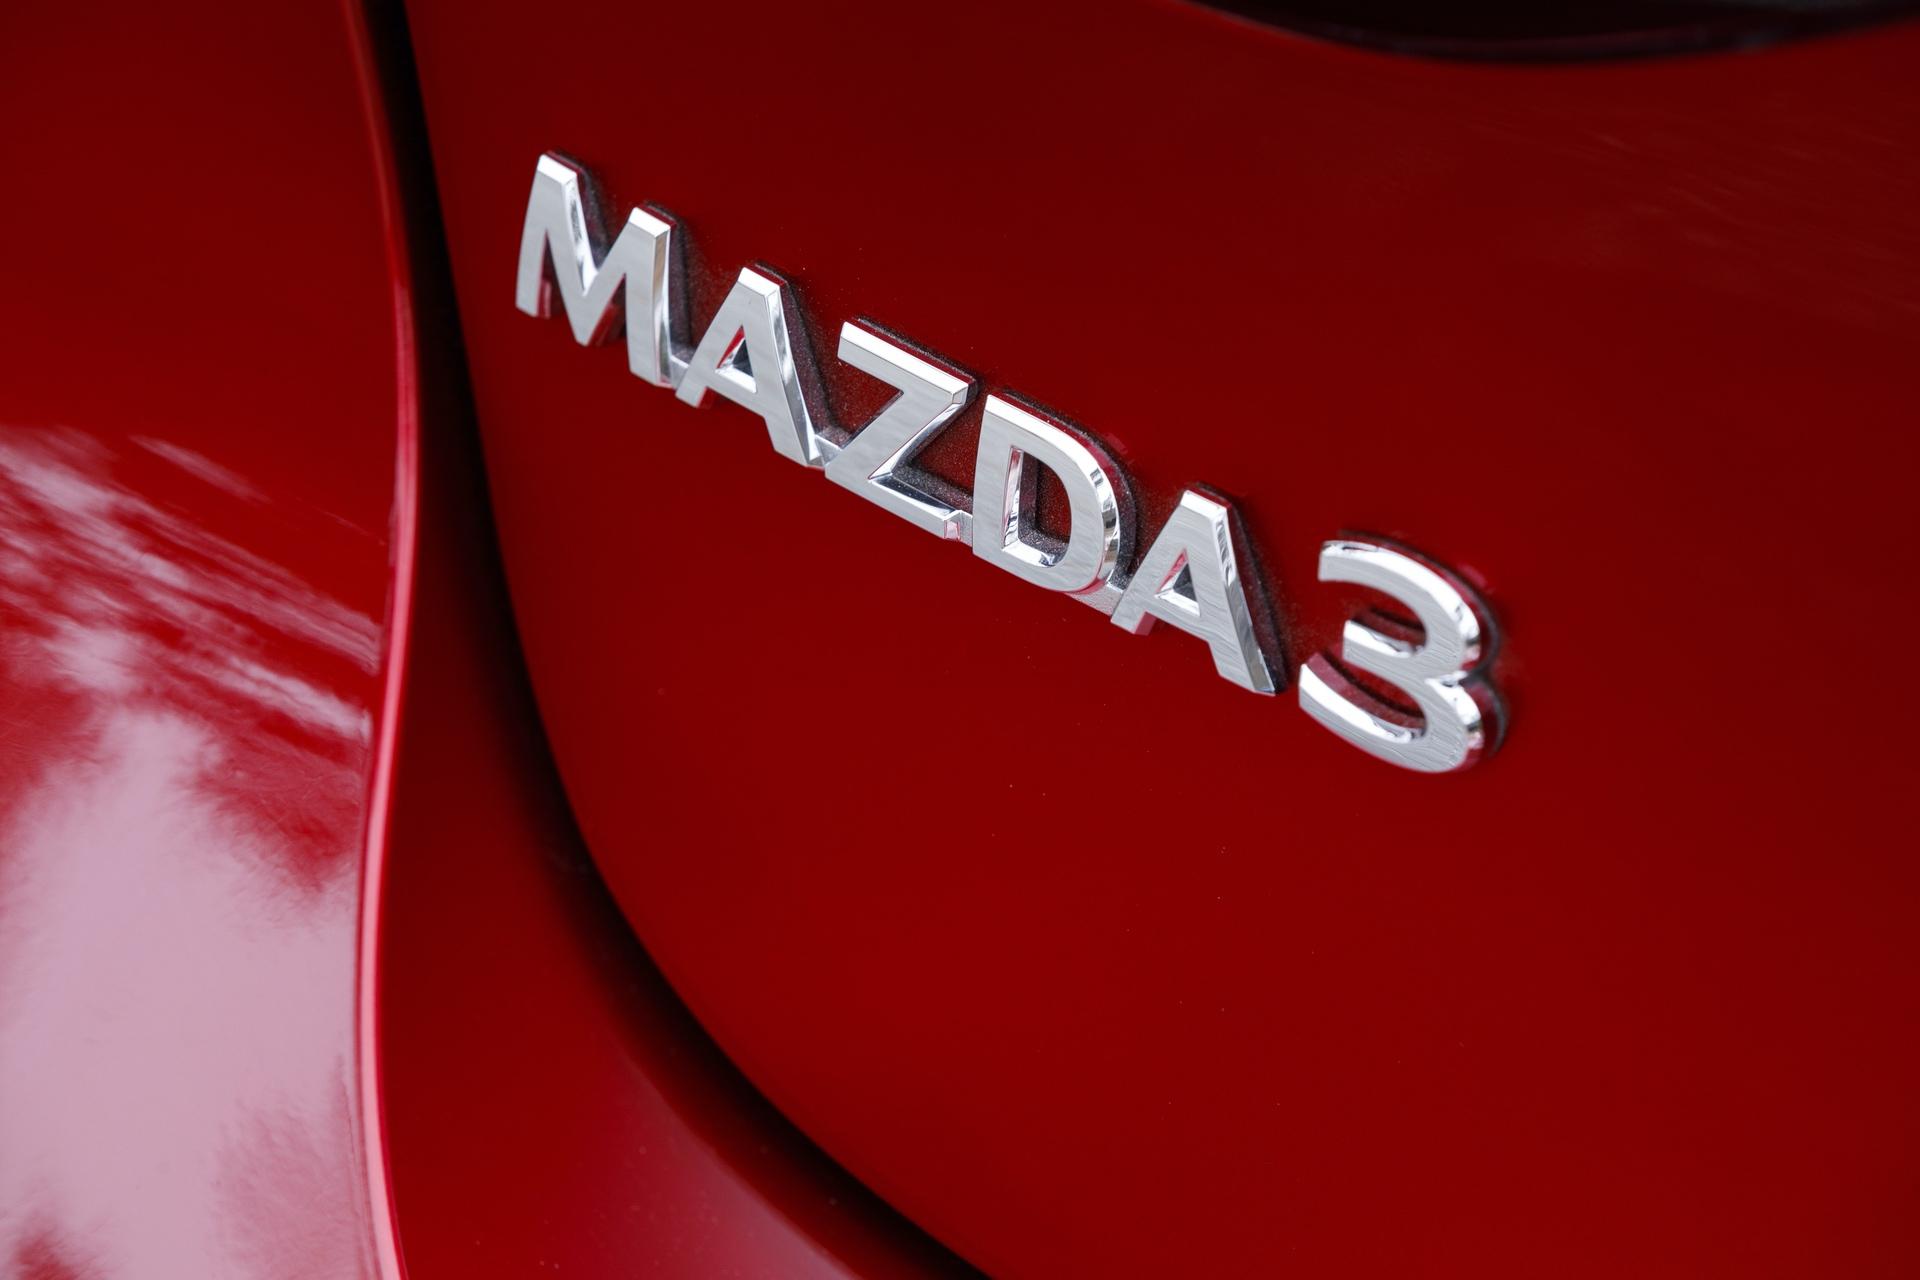 2019-Mazda3-Hatchback_21